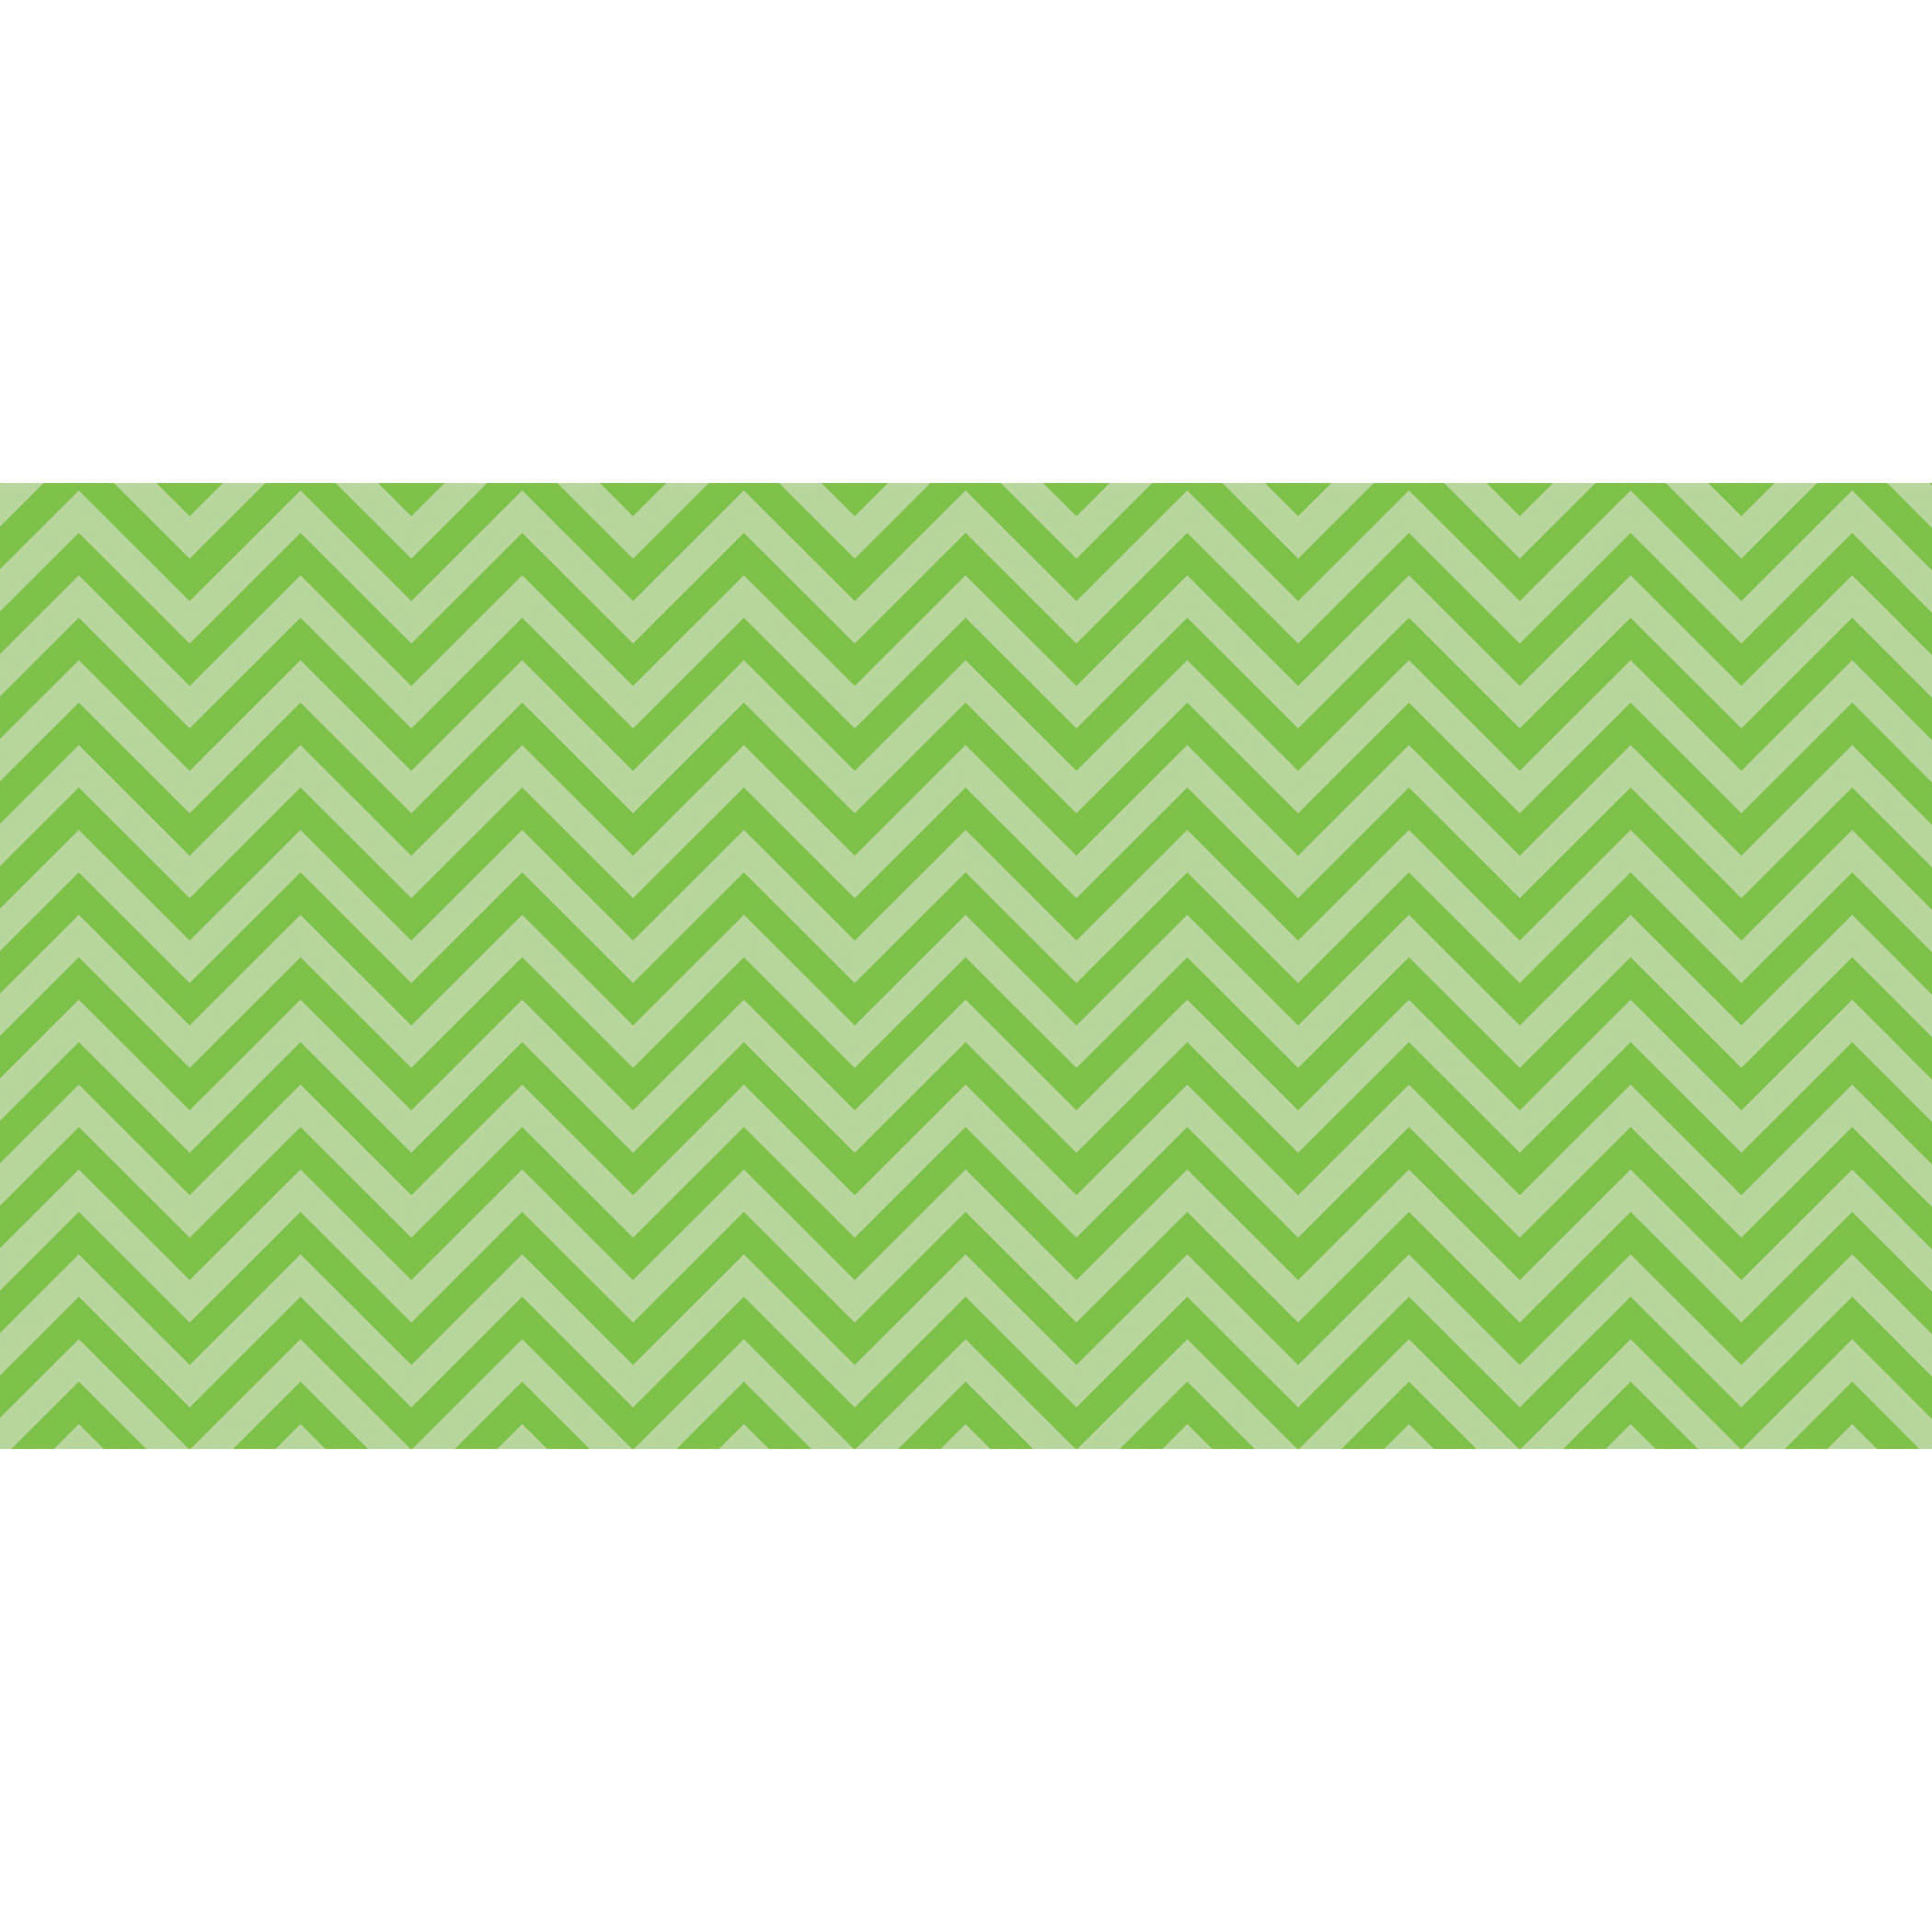 "Fadeless Bulletin Board Art Paper, Zebra Design, 48"" x 50' Roll"